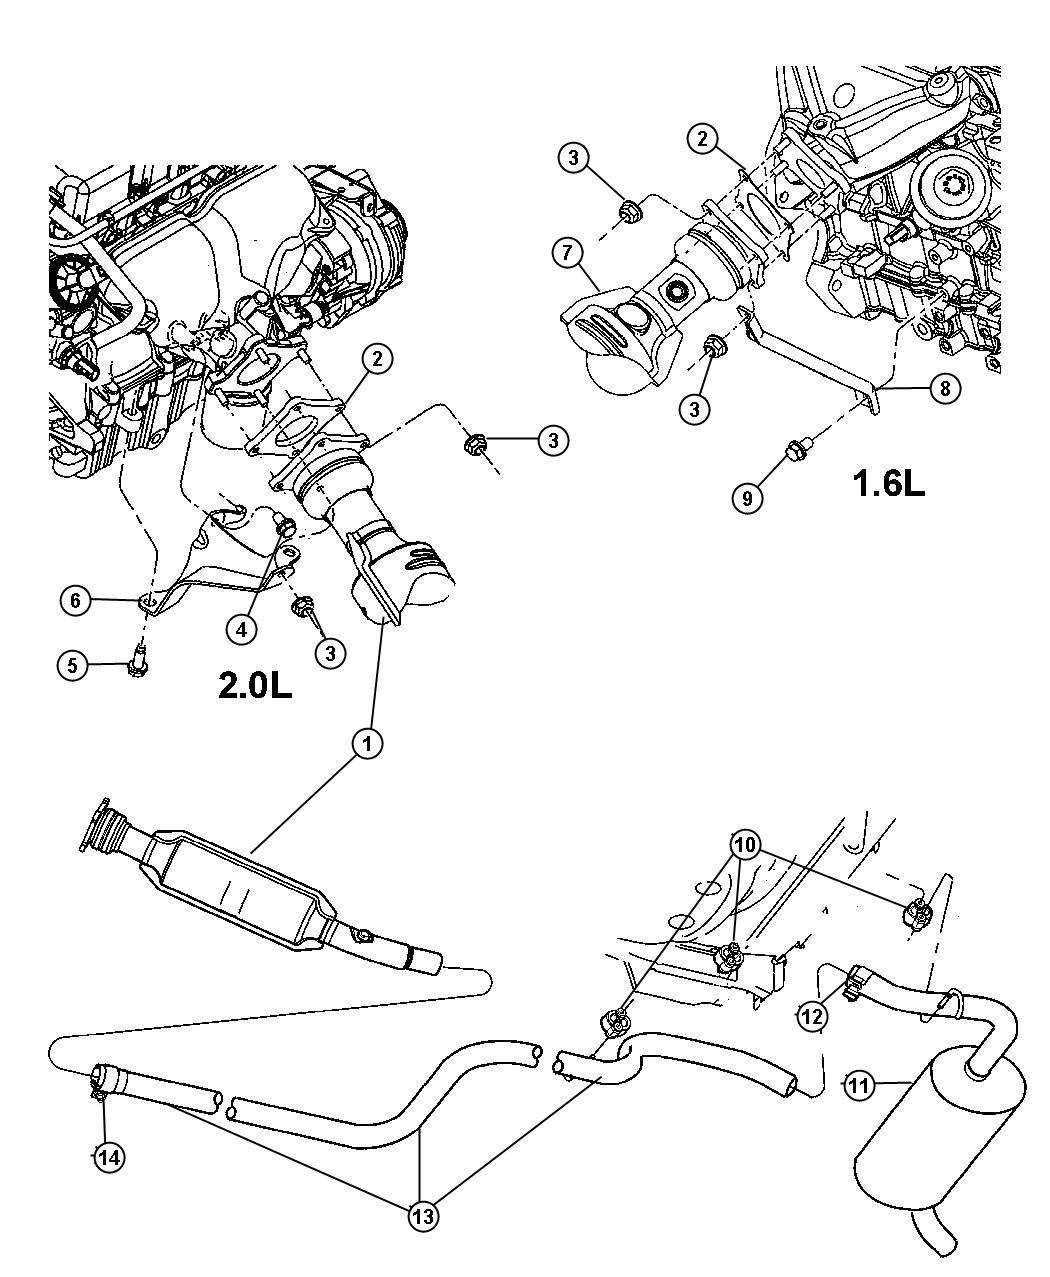 2002 Dodge Neon Clamp. Exhaust. Ratingblack, azq, xxq